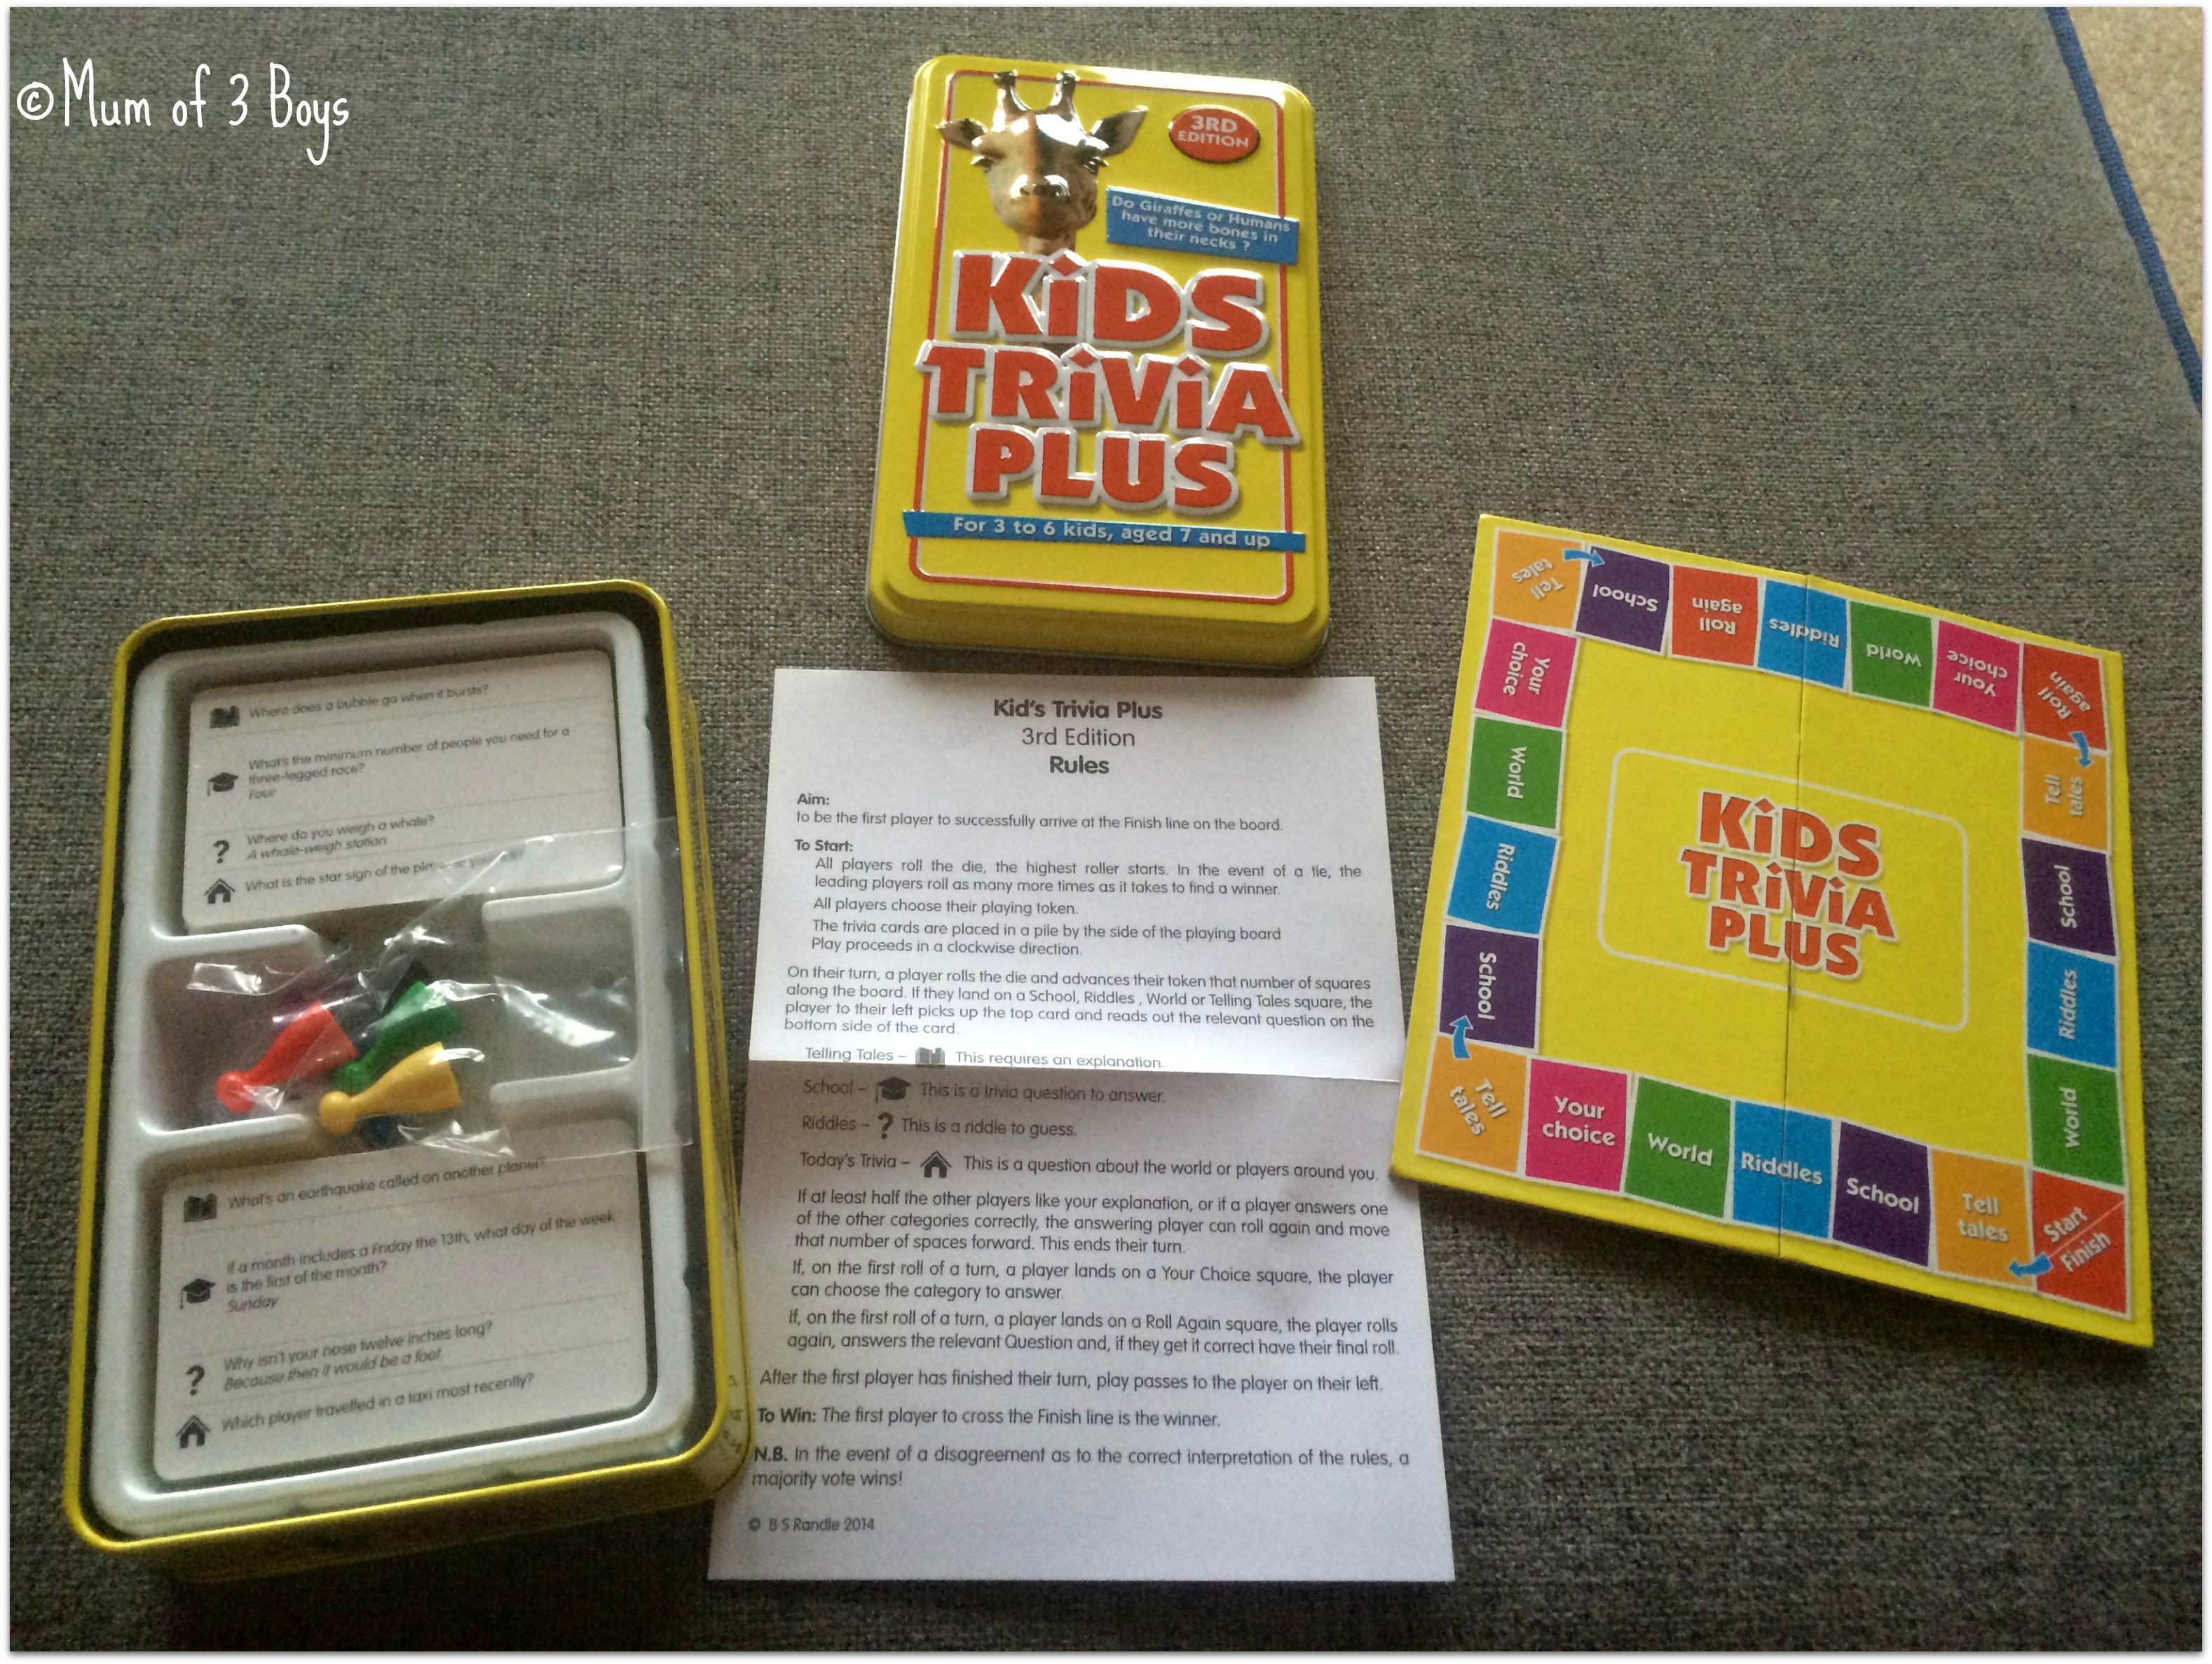 kids trivia plus box